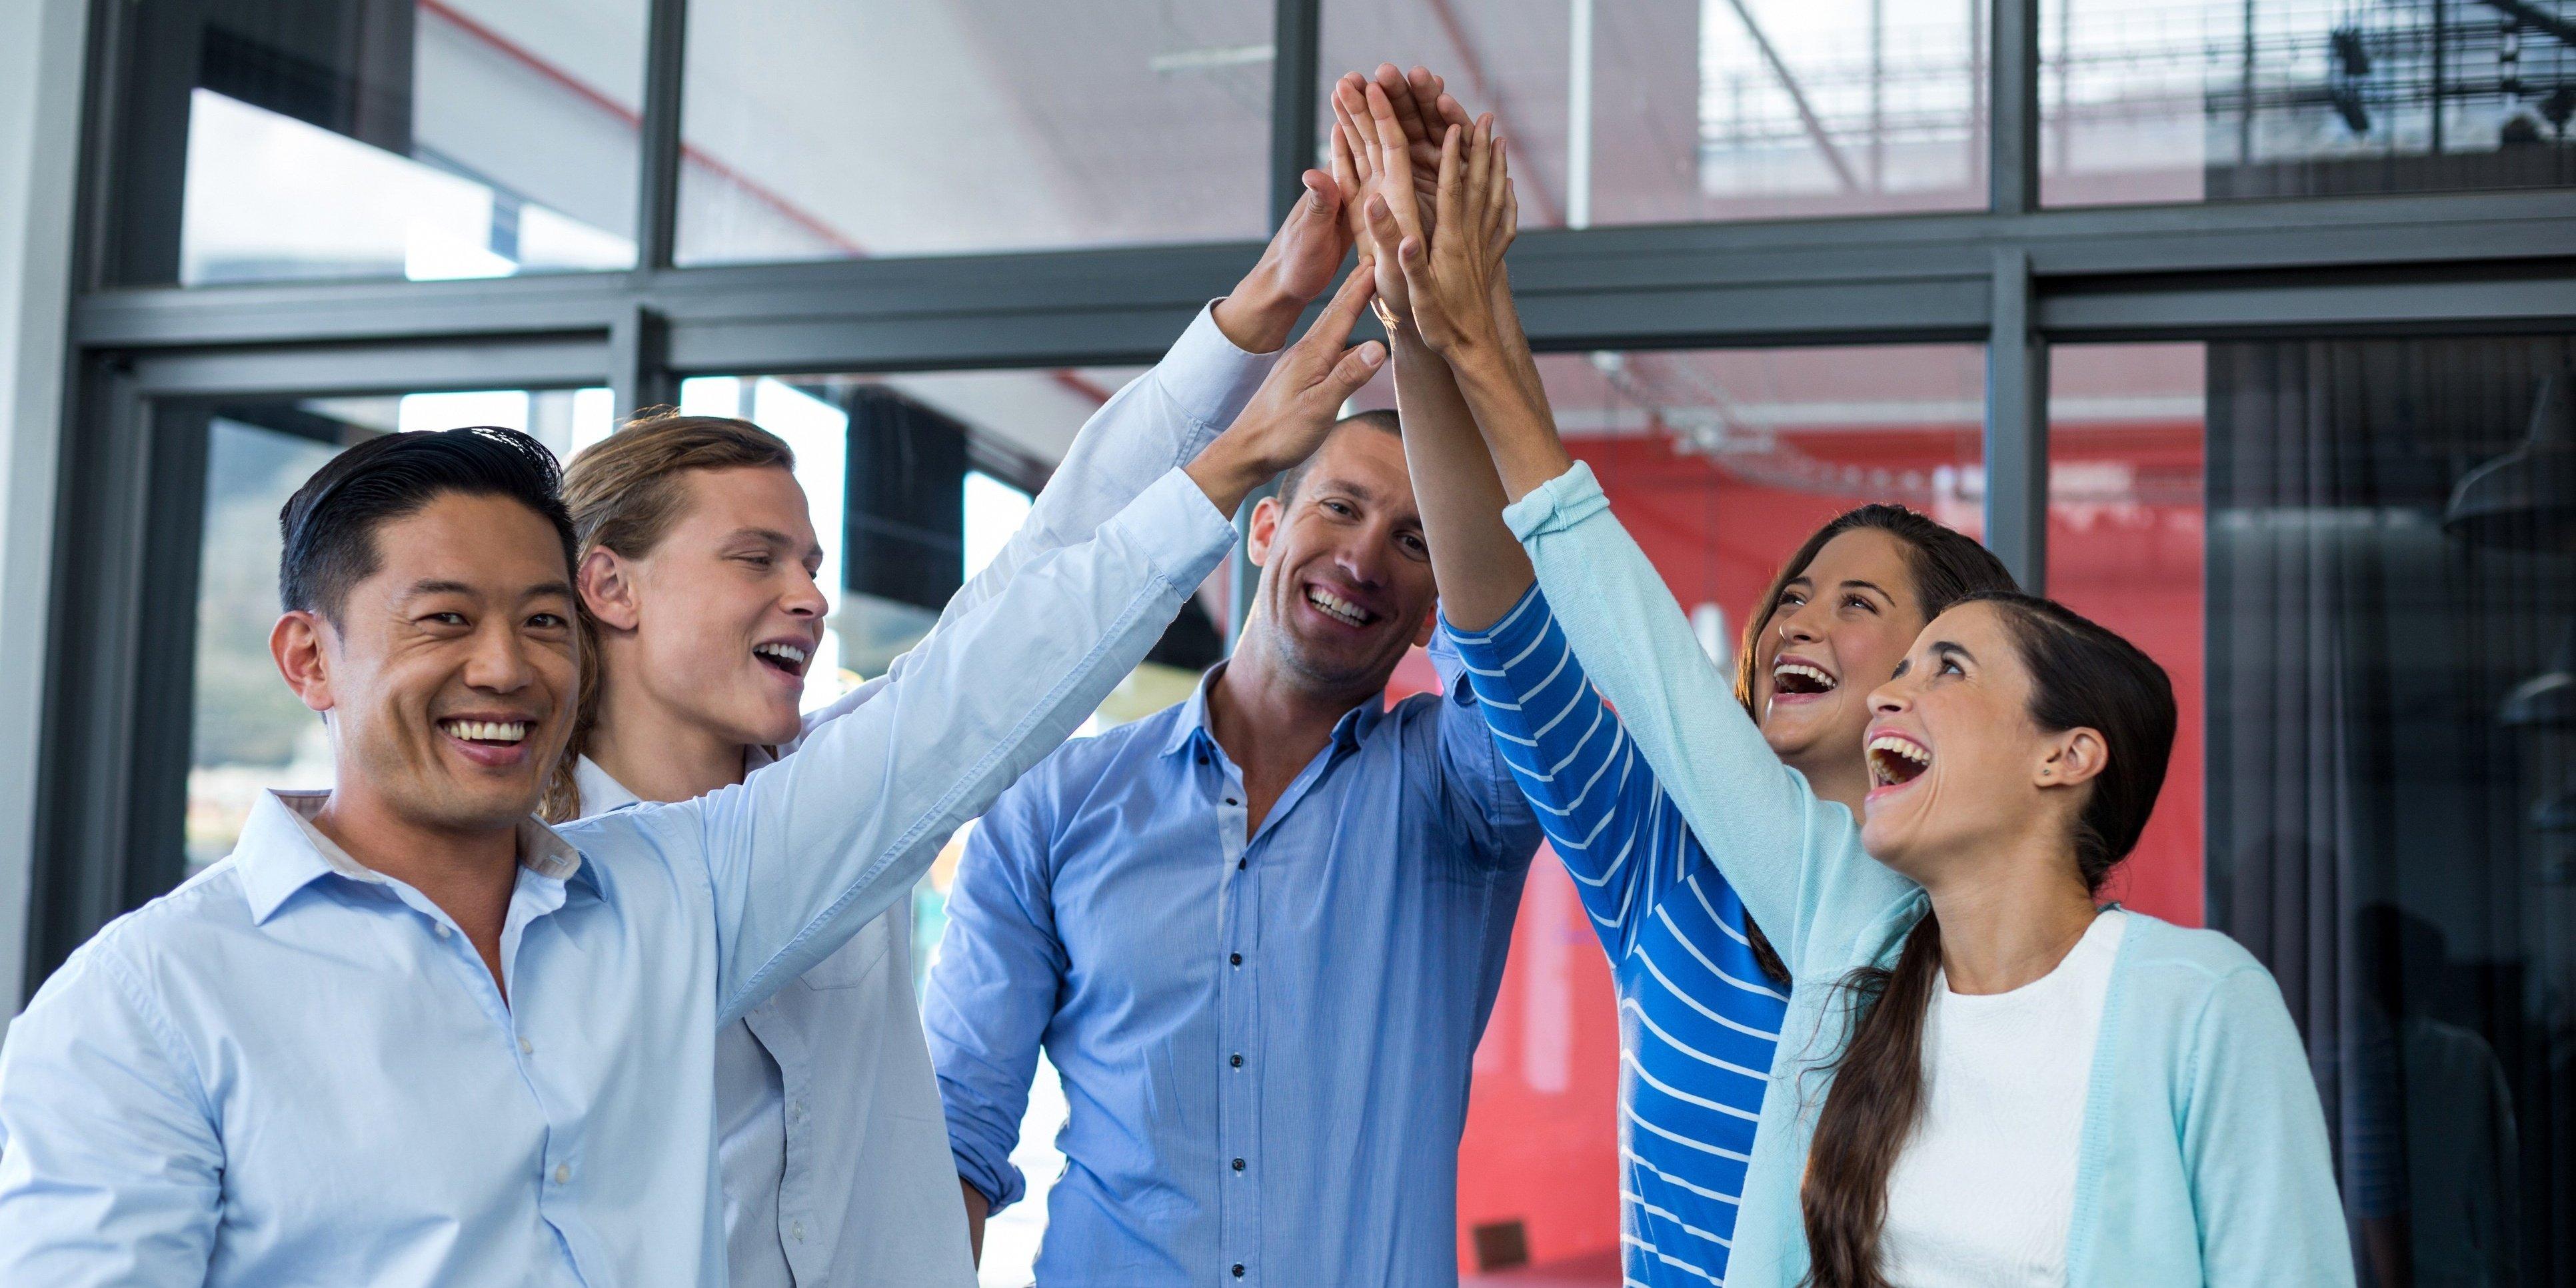 salespeople building relationships